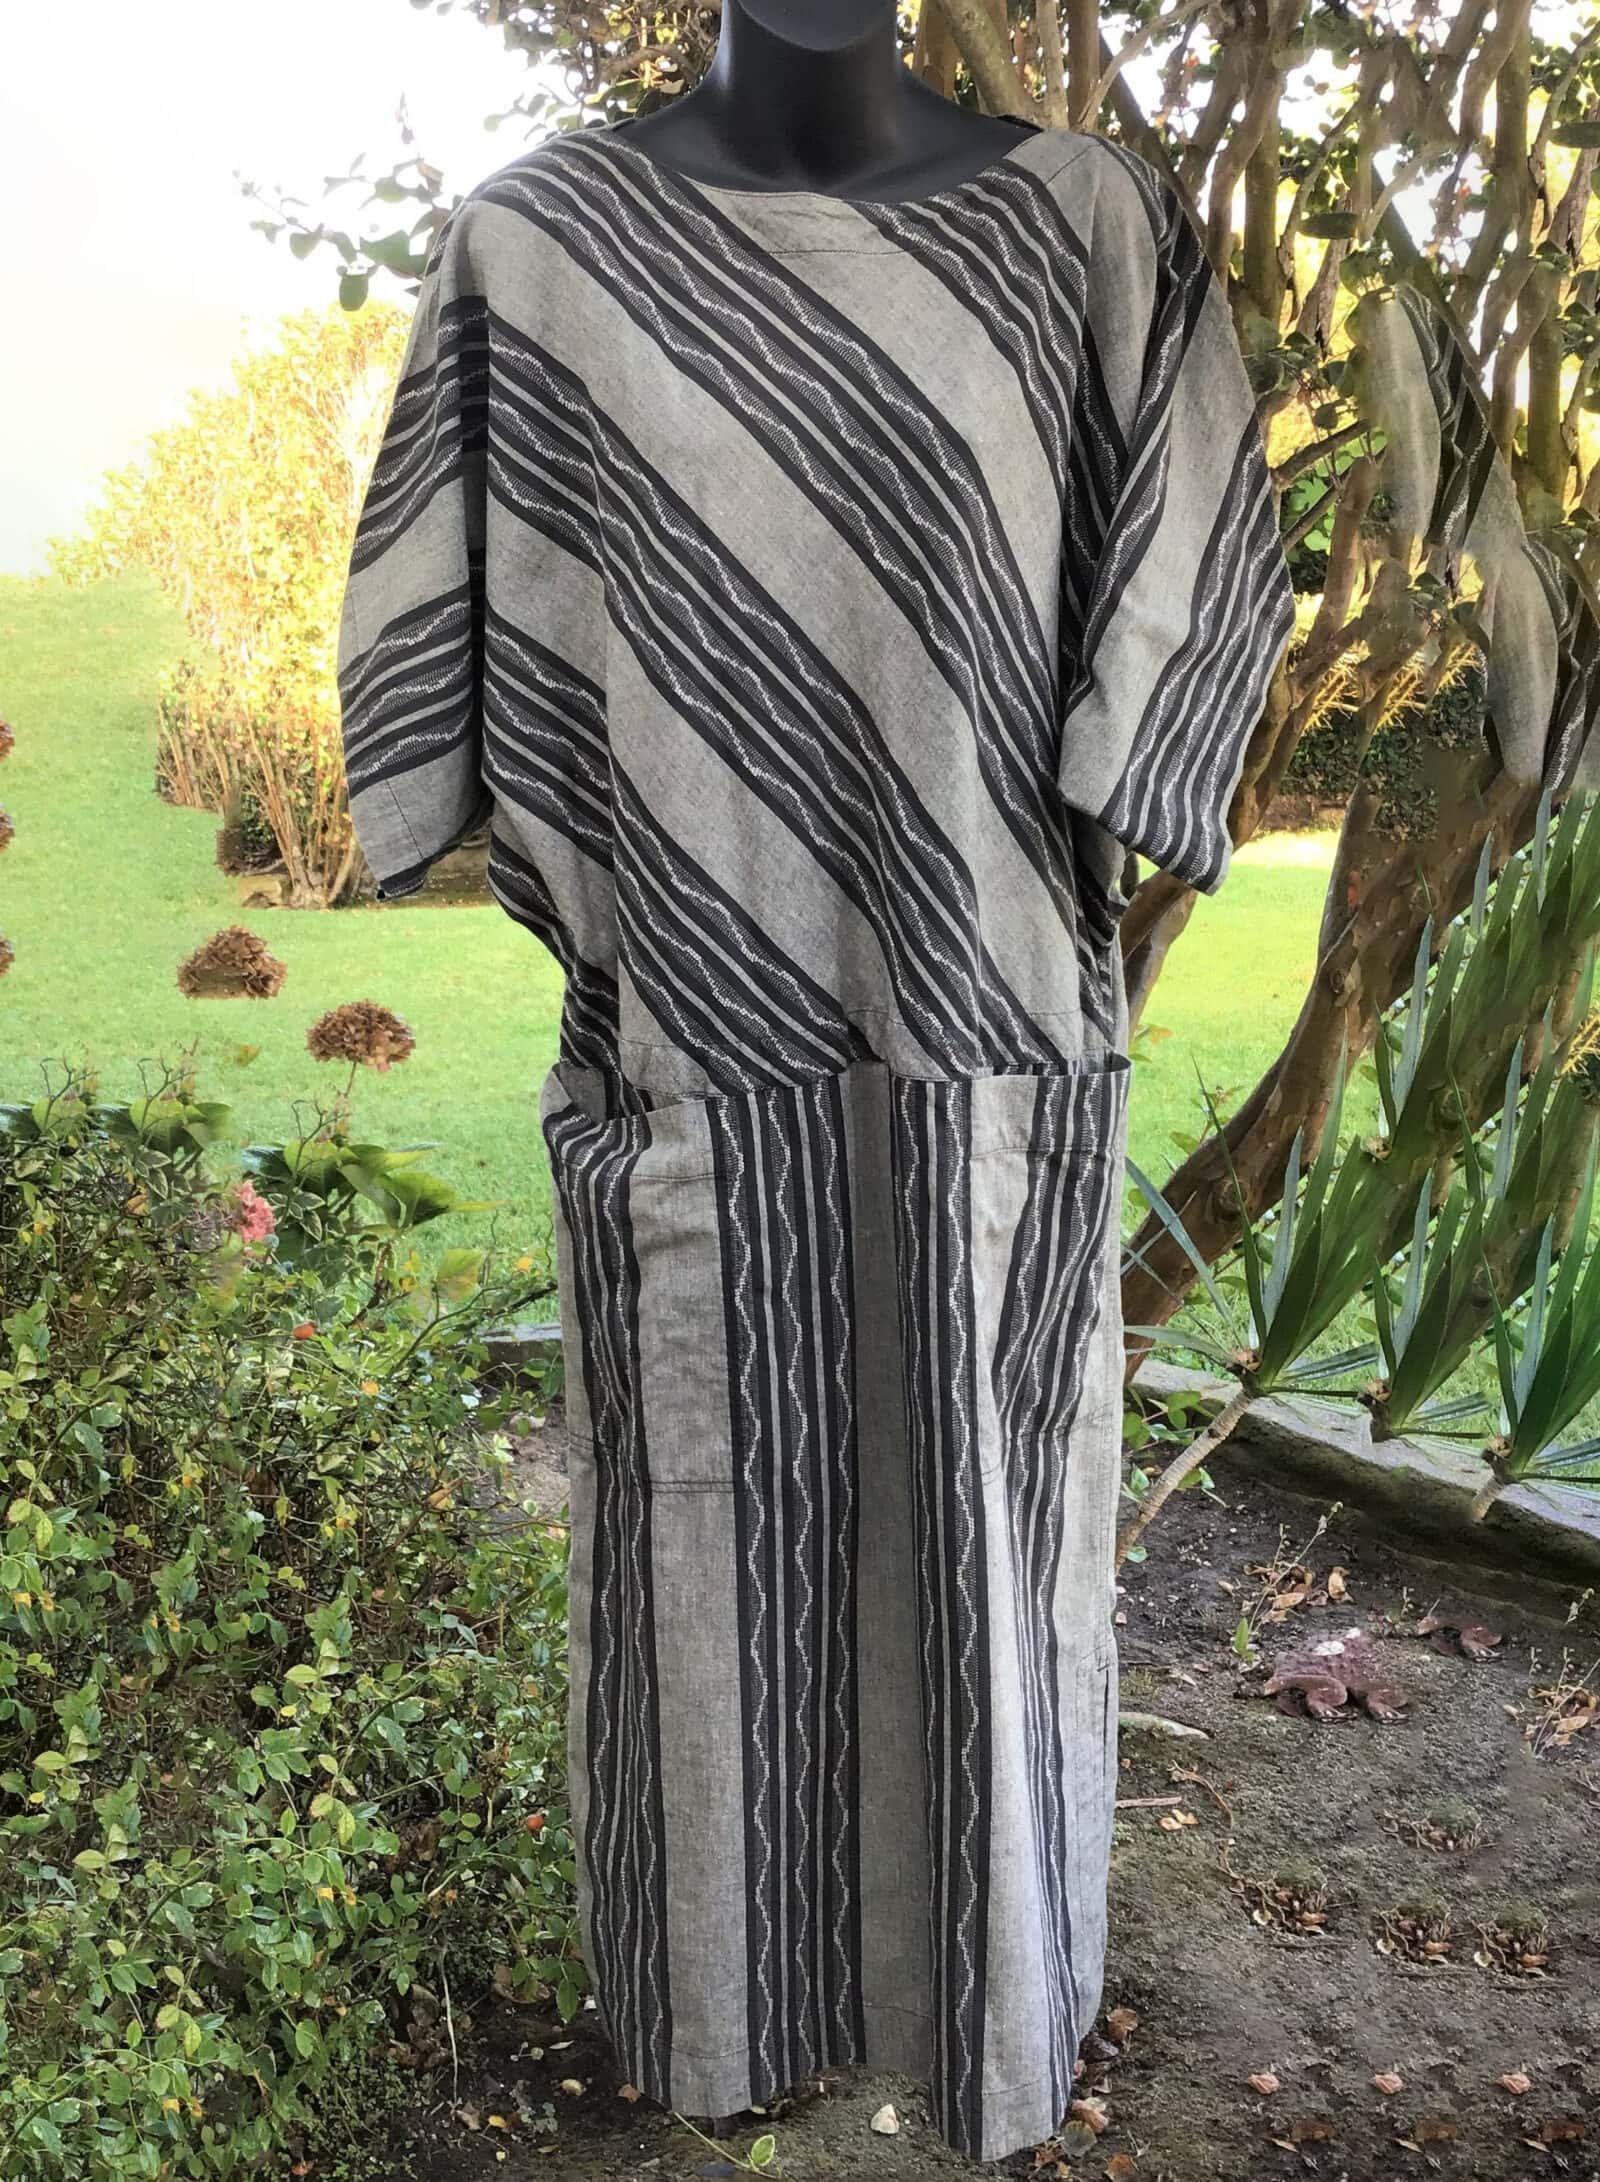 Vintage ISSEY MIYAKE Plantation Cotton Gray:Black Striped Short Sleeve Dress Size Medium